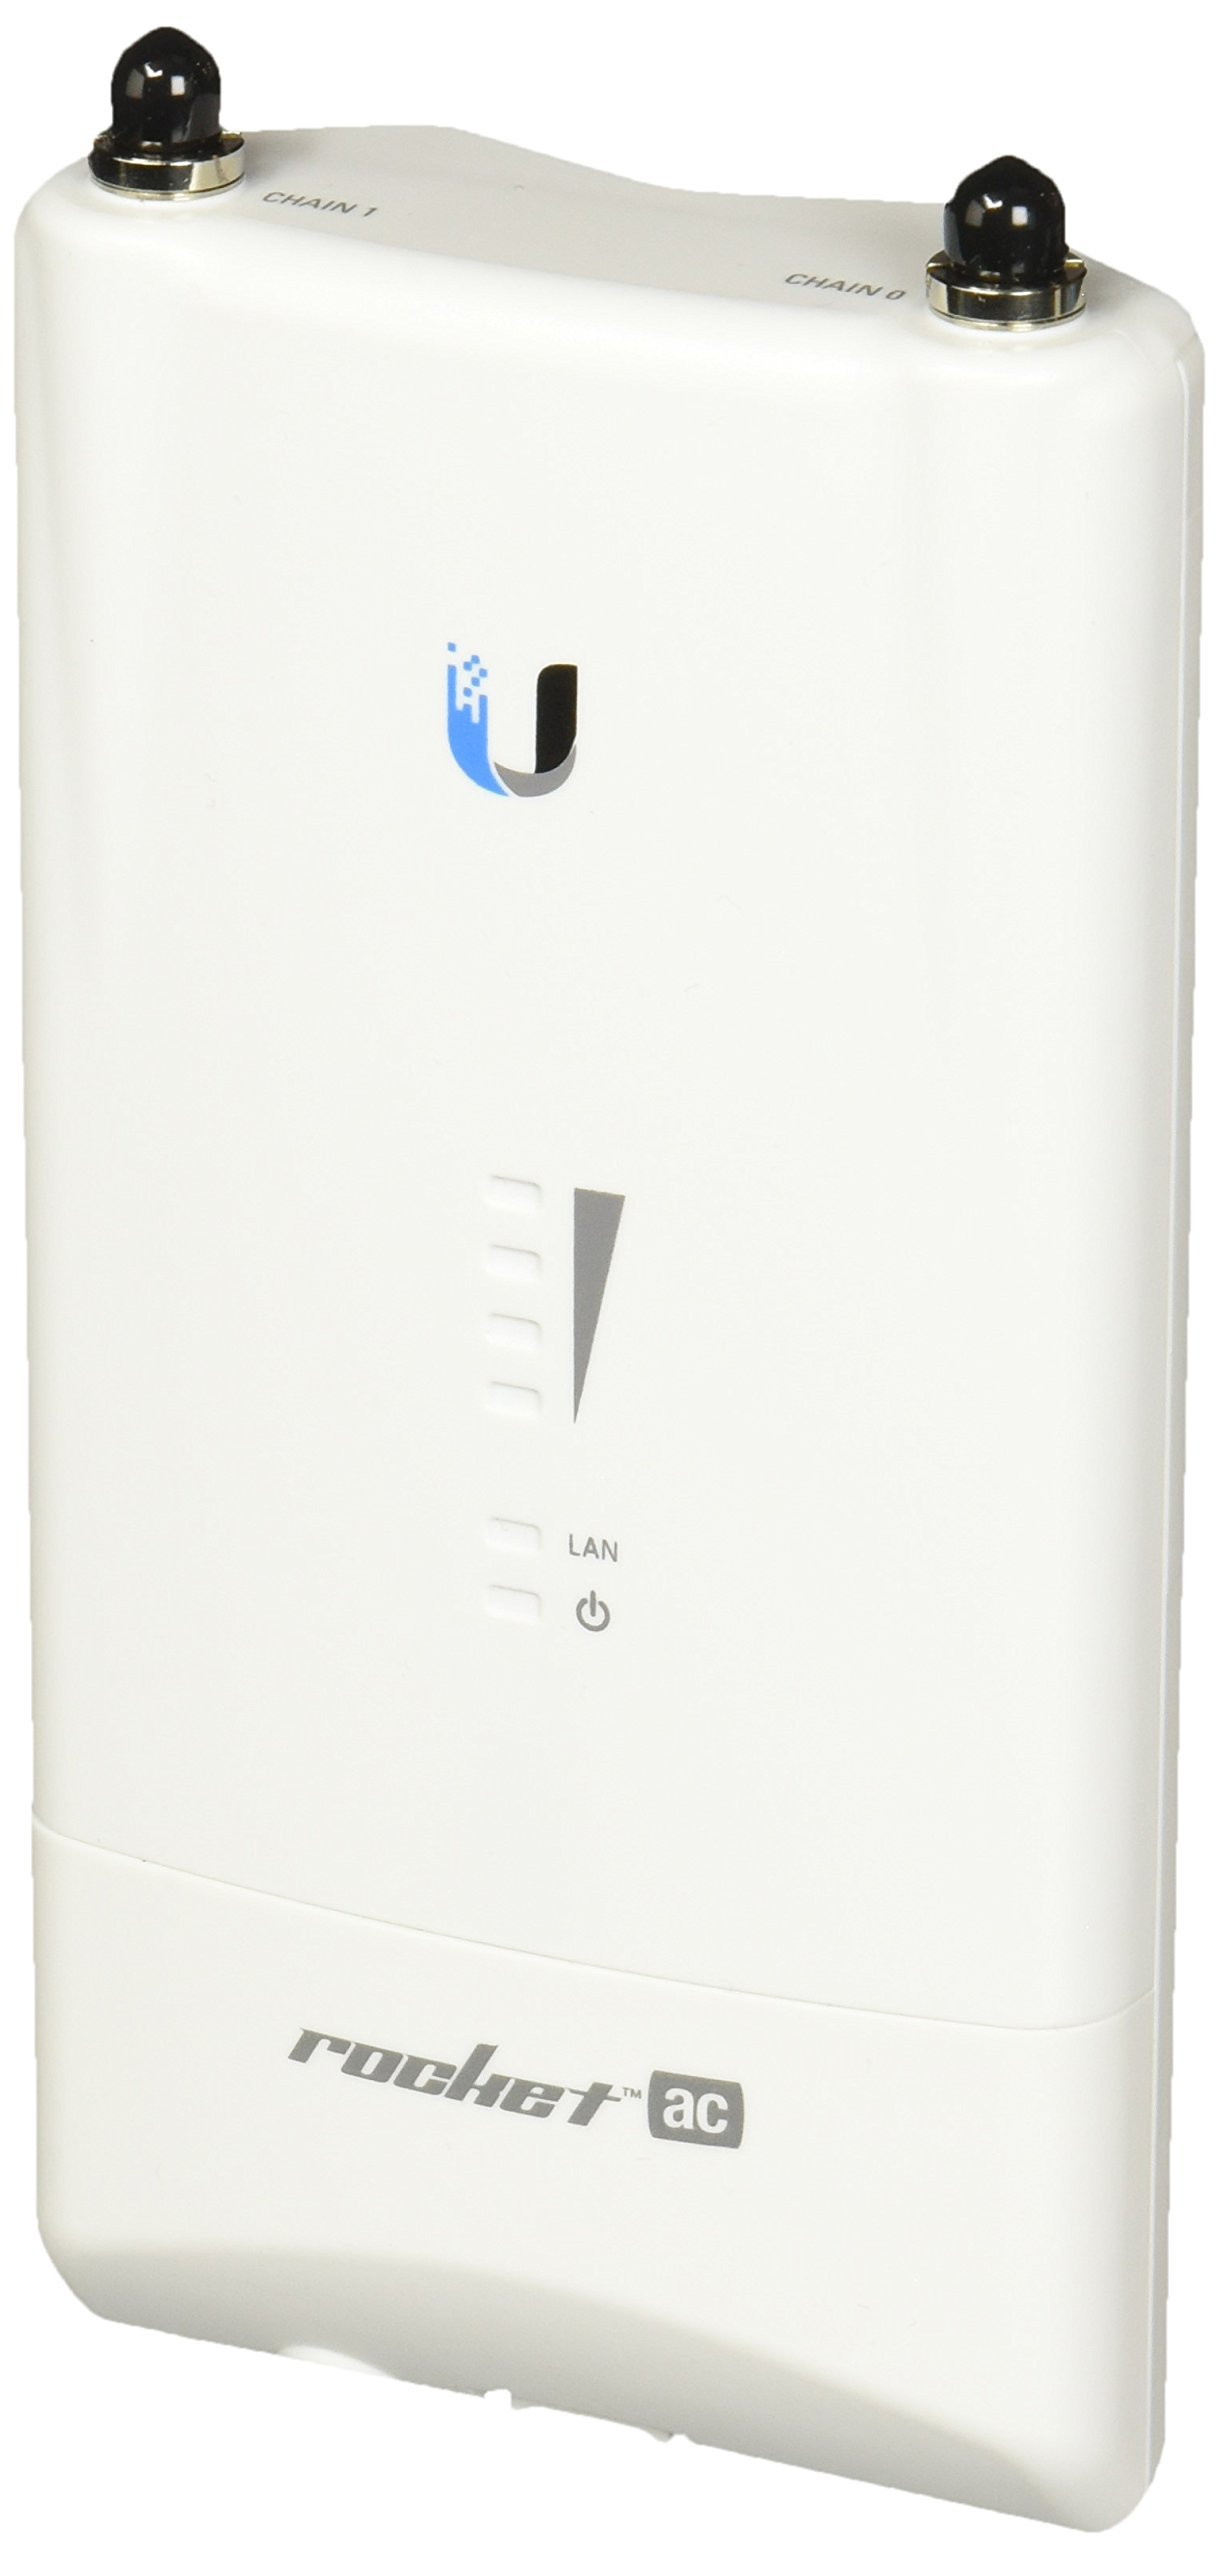 Ubiquiti Rocket AC Wireless Access Point (R5AC-LITE) by Ubiquiti Networks